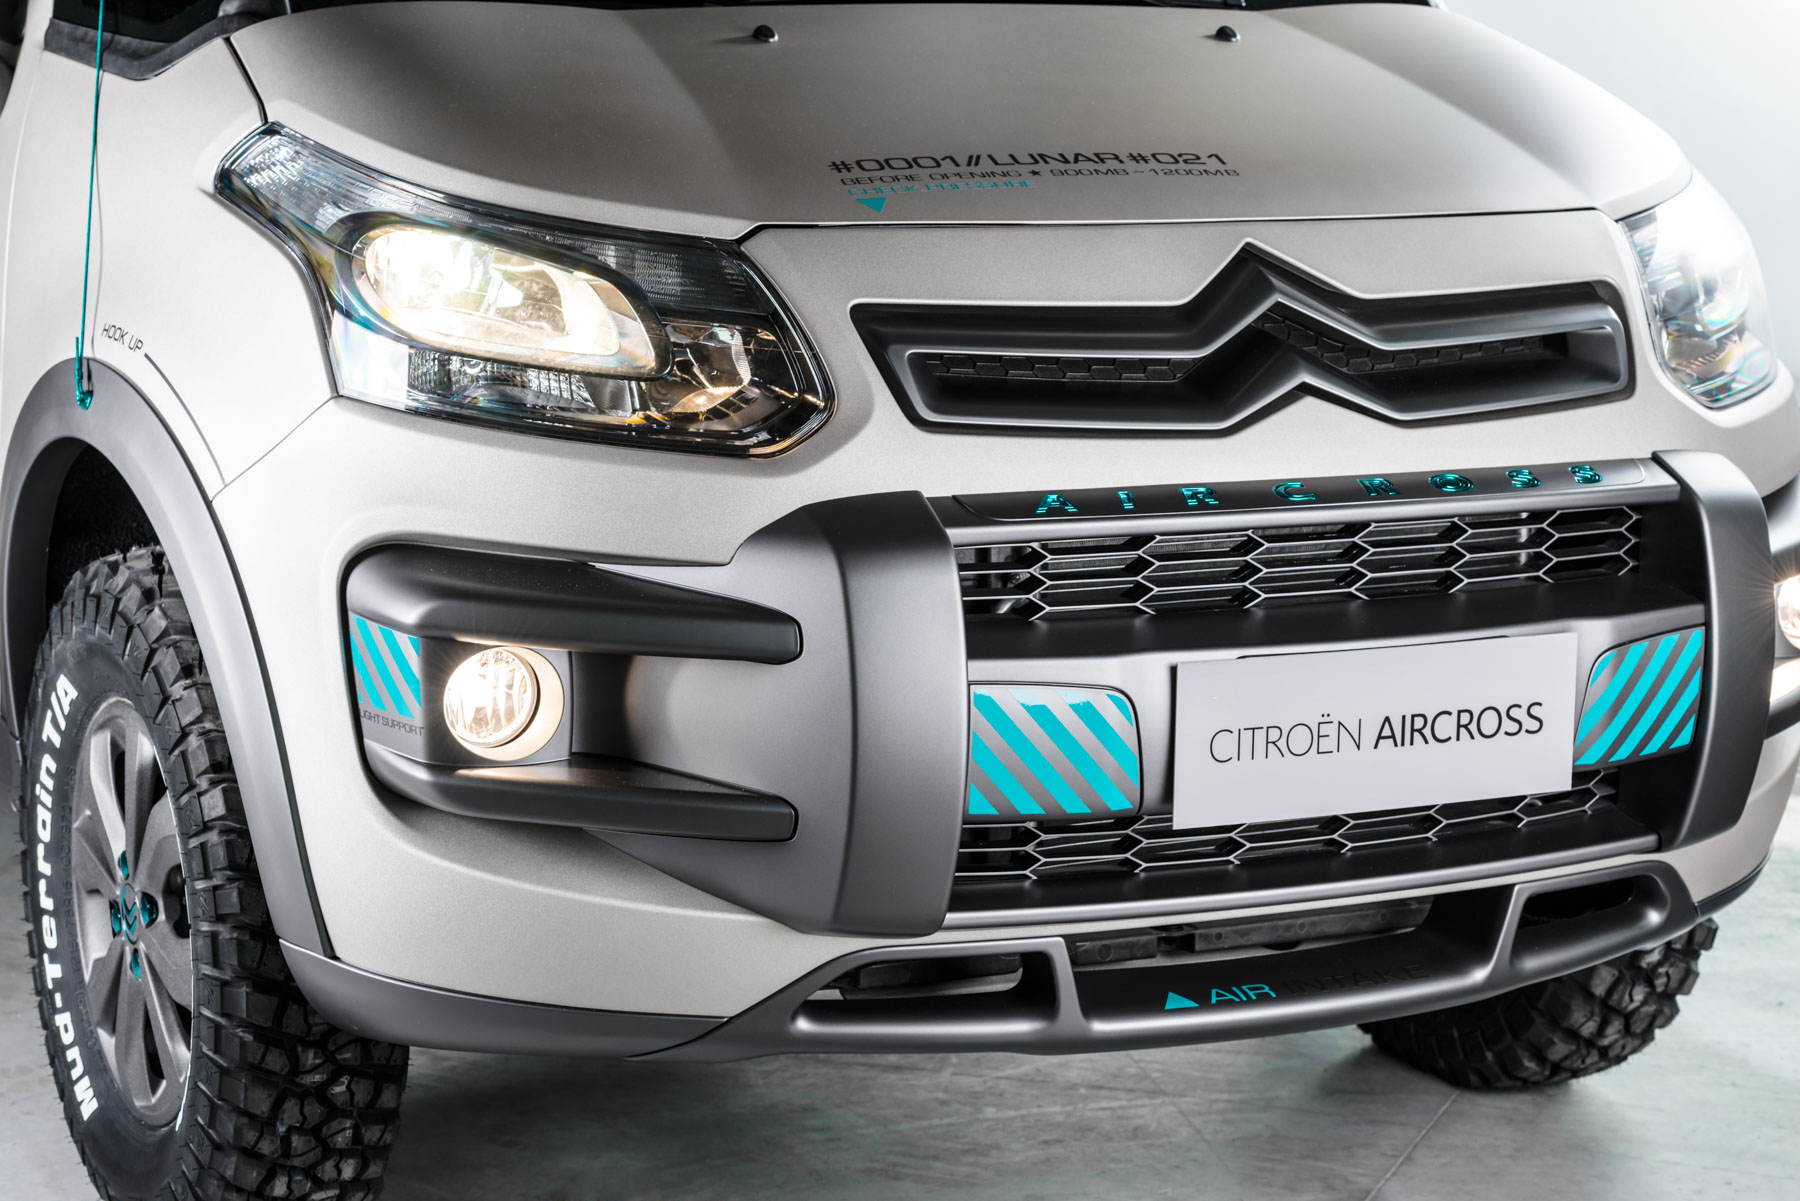 Citroën AIRCROSS Salomon (Brazil) MS+ BLOG